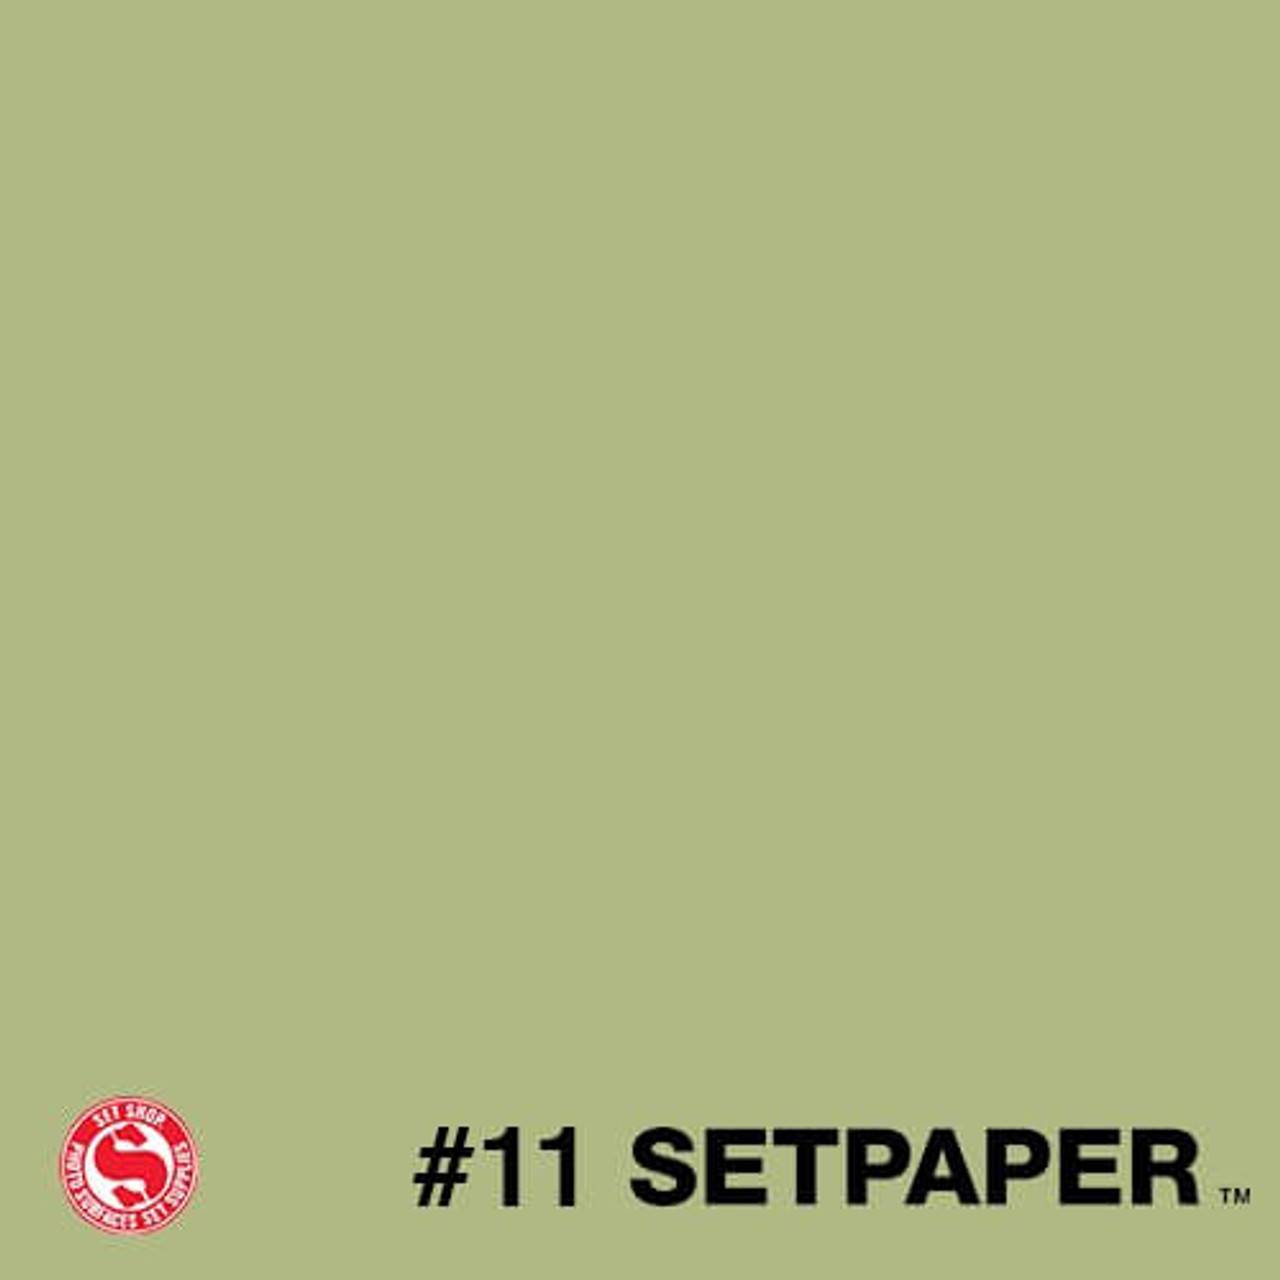 "111 SETPAPER - SUNNY GREEN 53"" x 36' (1.3 x 11m)"